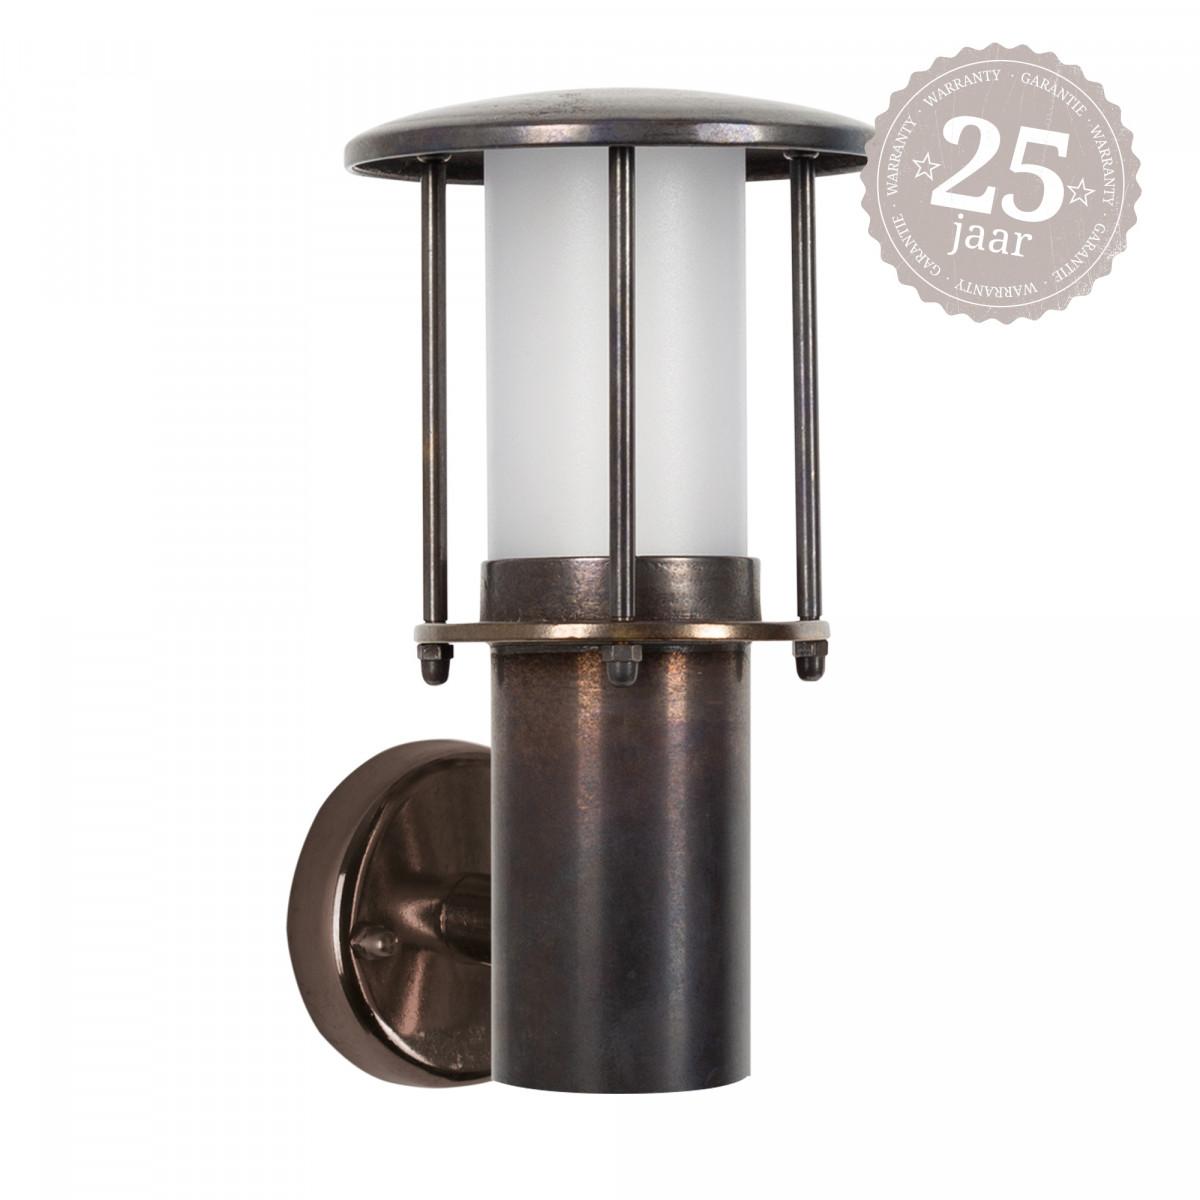 Muurlamp Resident dark brass